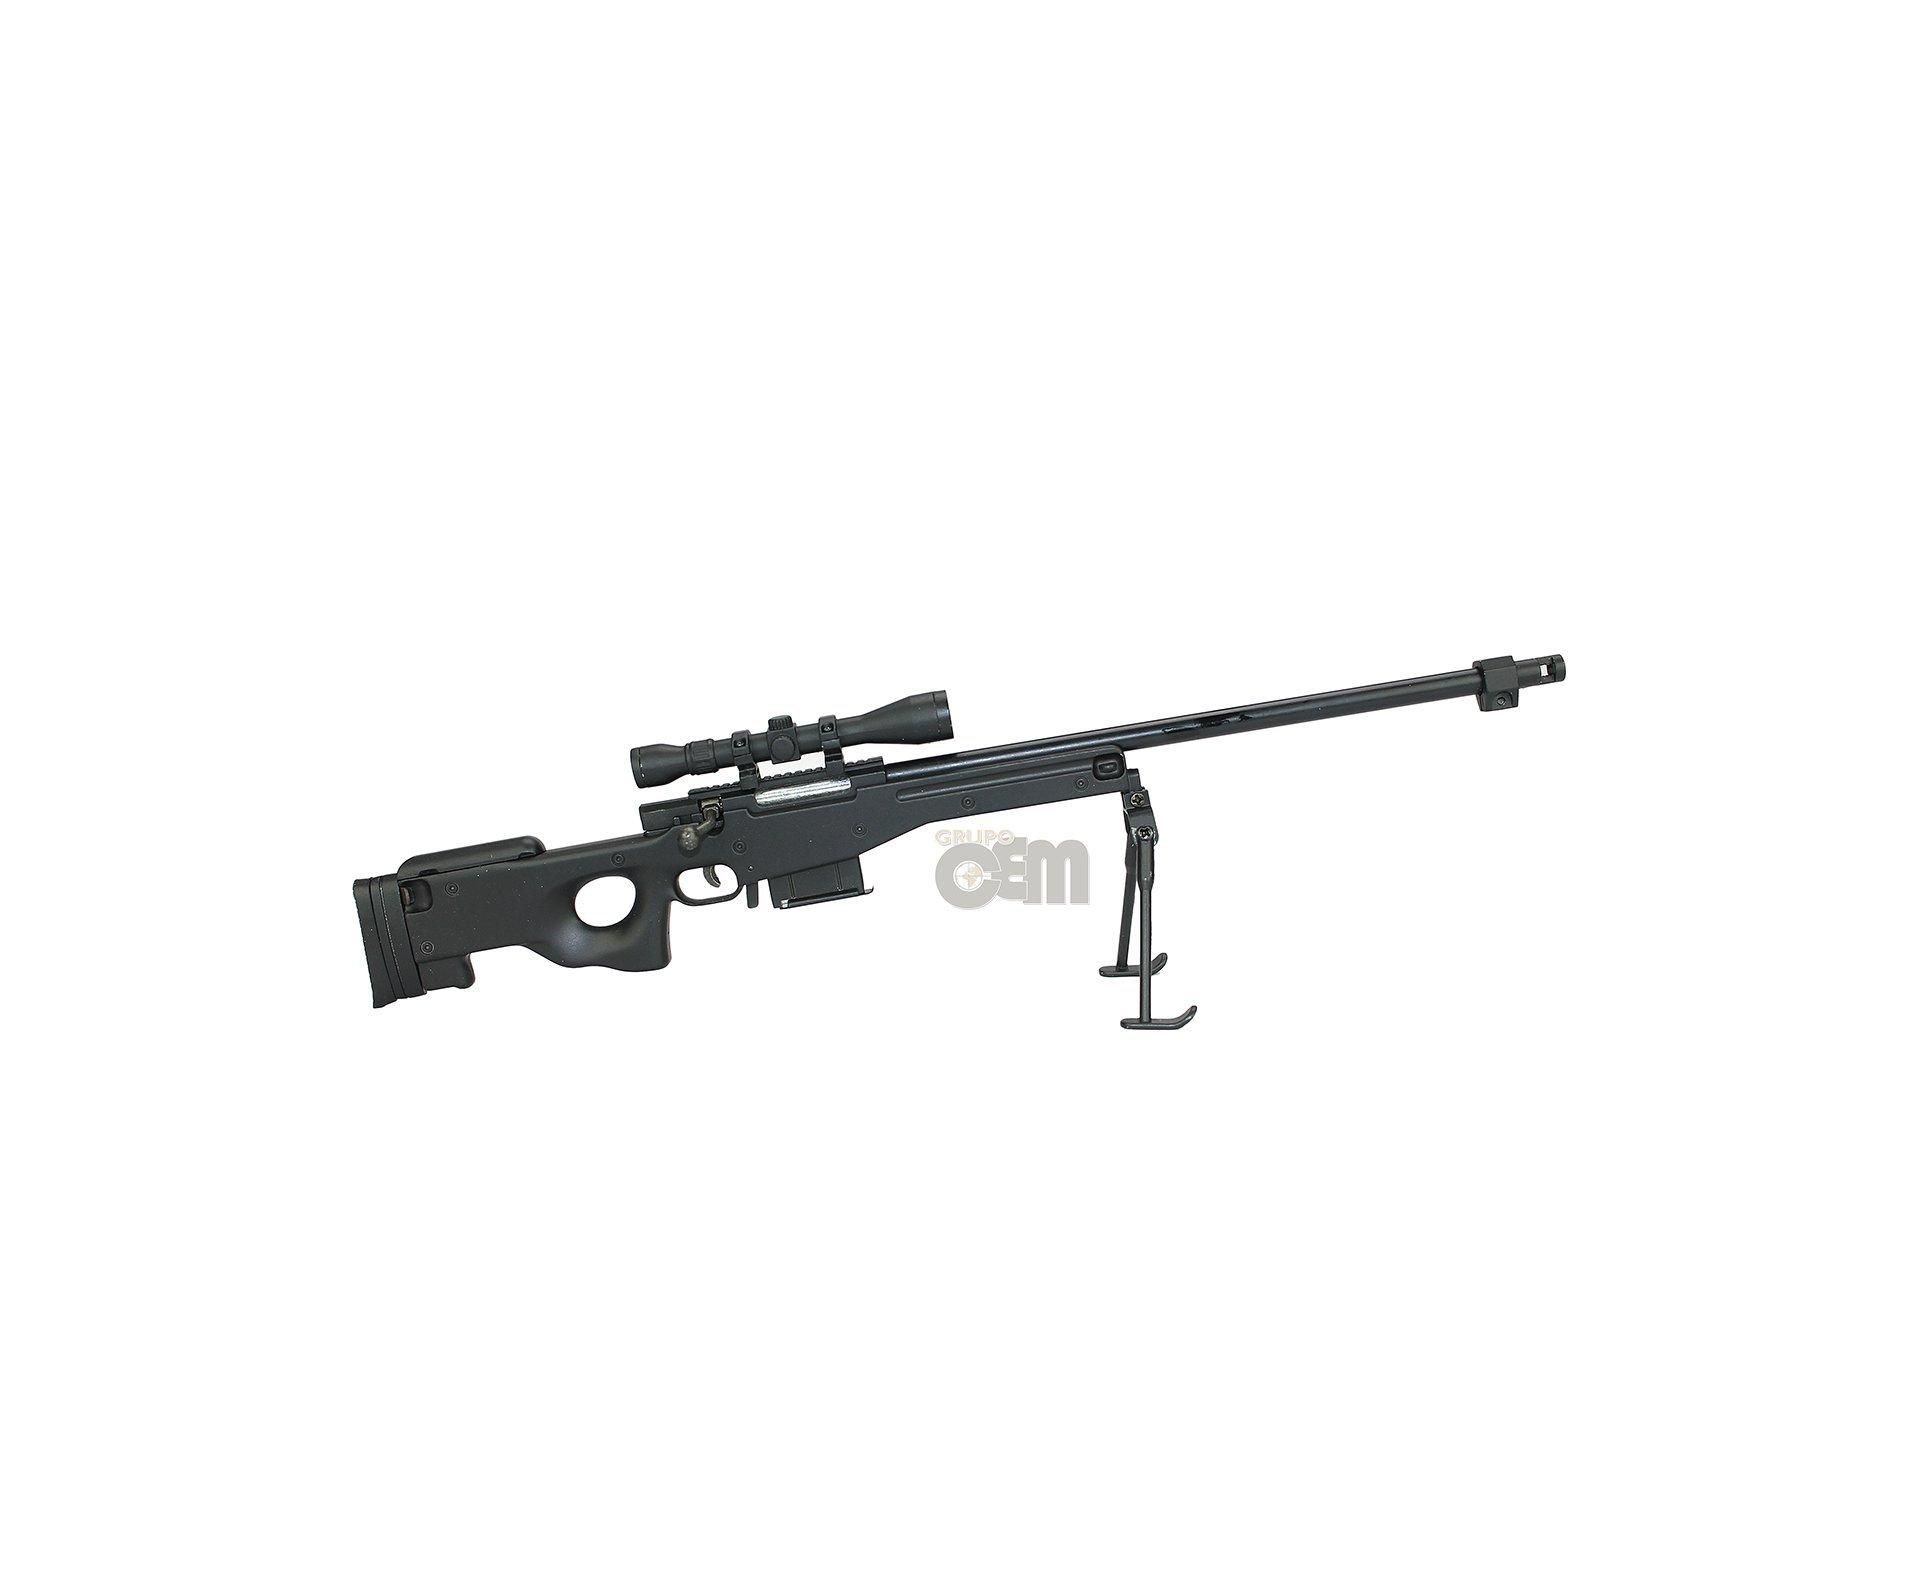 Rifle L96 Black Miniatura Metálica - Tactical - Arsenal Guns